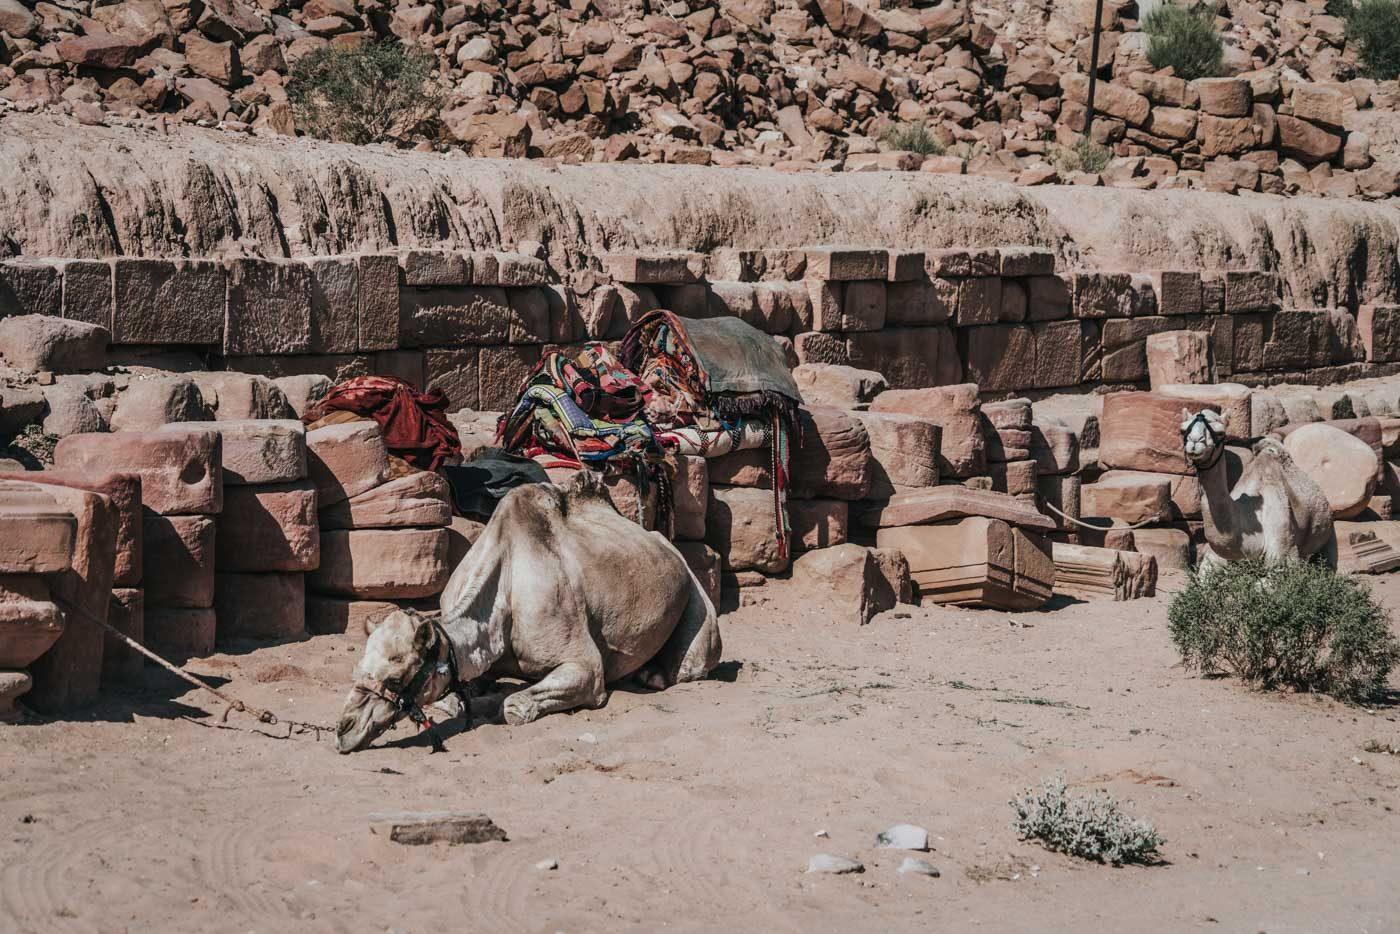 Camels resting in the heat in Petra, Jordan